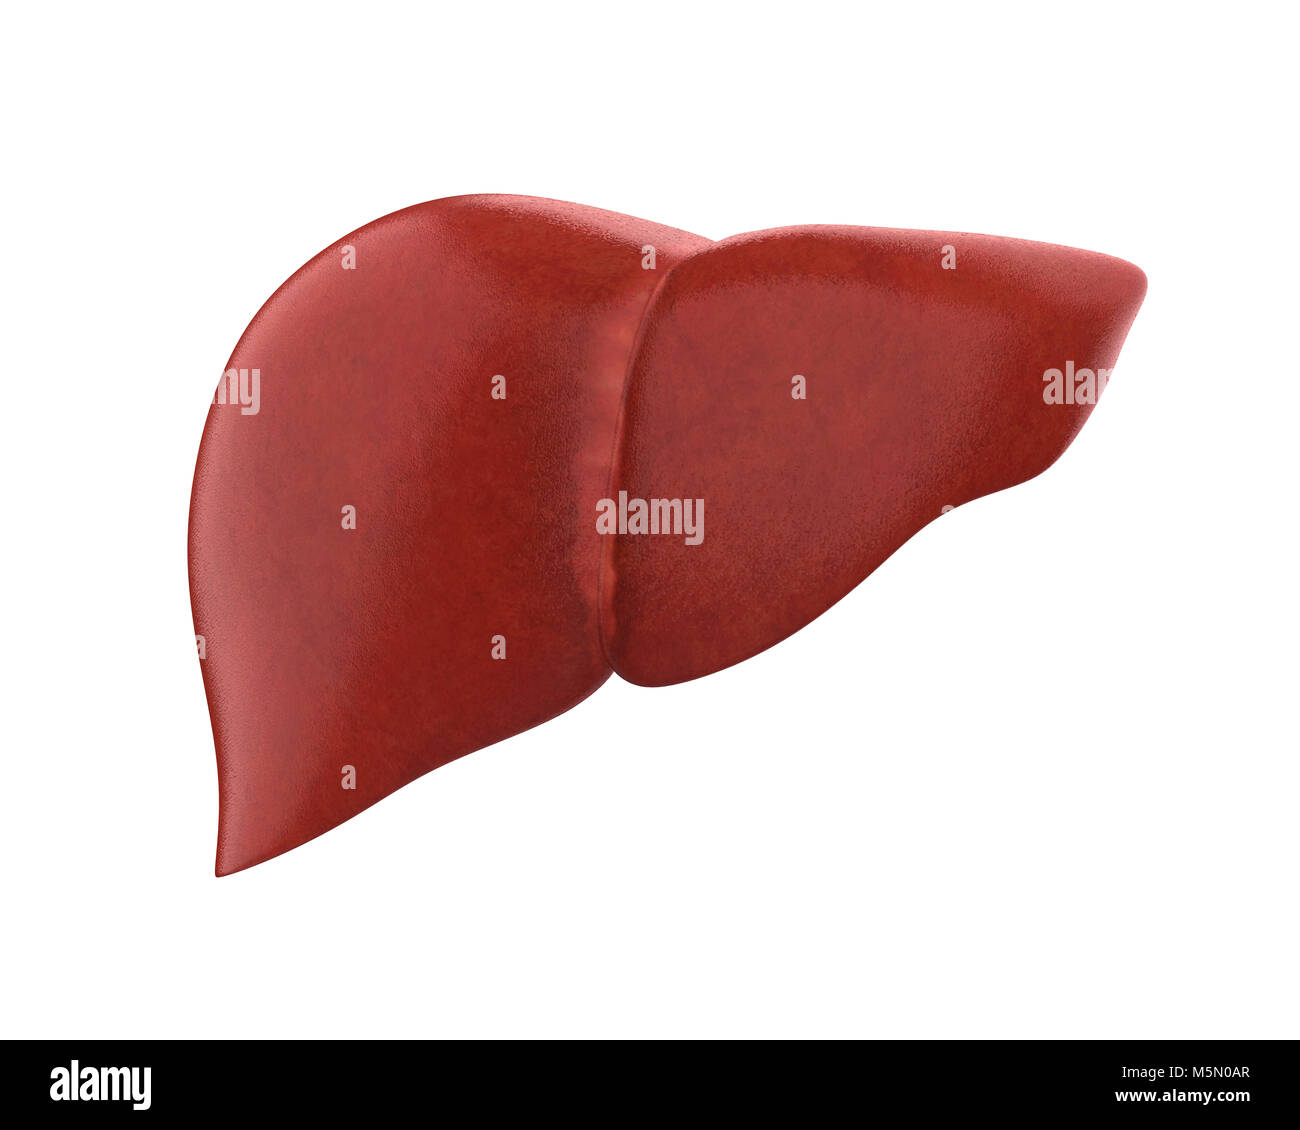 Human Liver Anatomy Stock Photo 175638255 Alamy